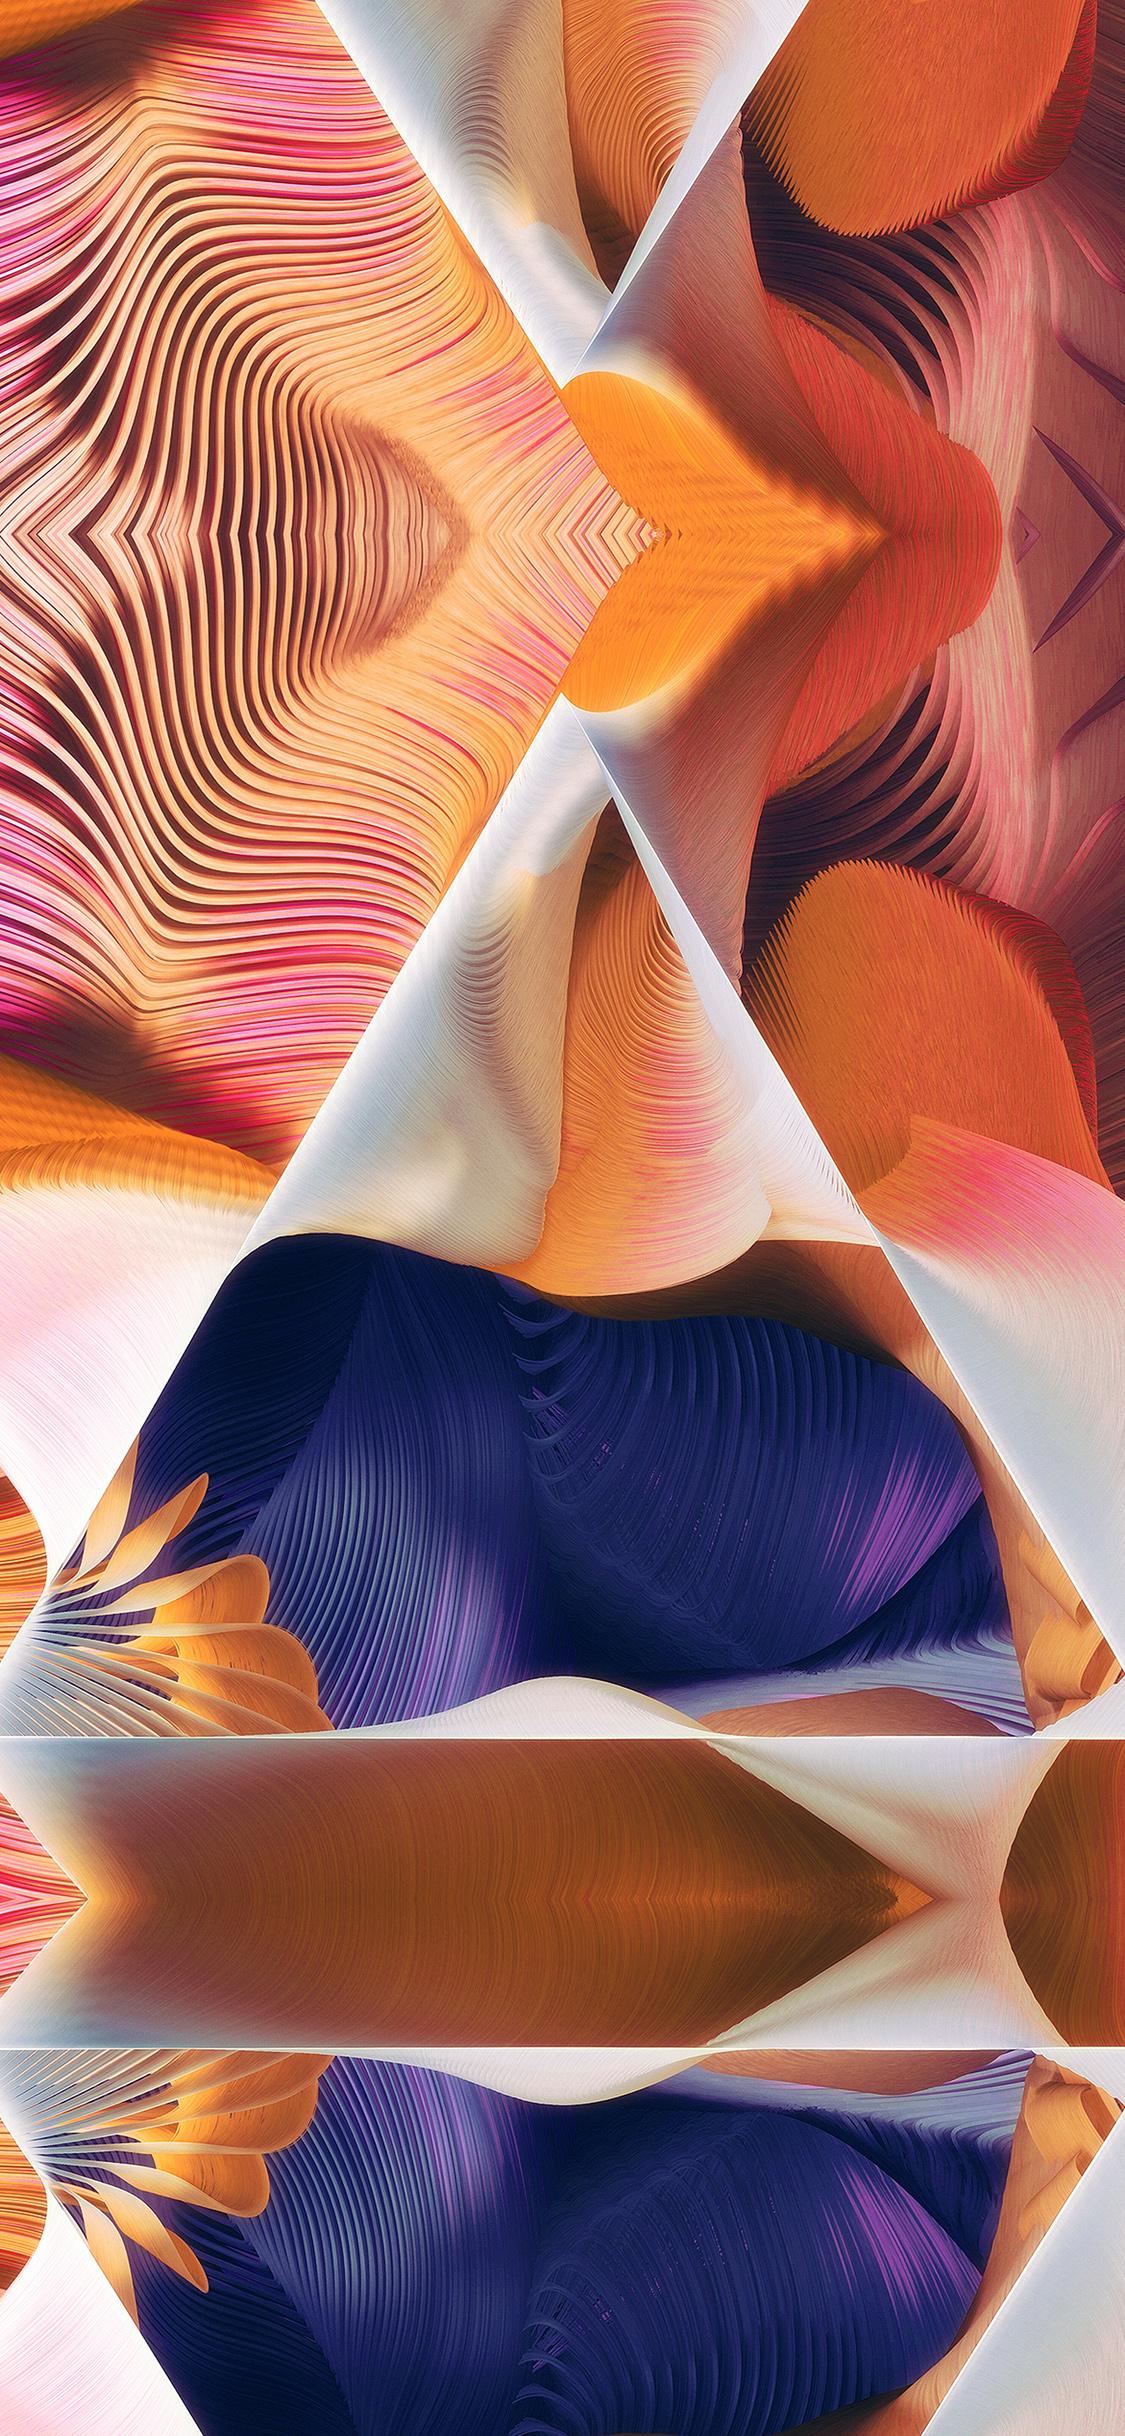 iPhoneXpapers.com-Apple-iPhone-wallpaper-ar71-traingle-plums-ari-weinkle-art-illustration-orange